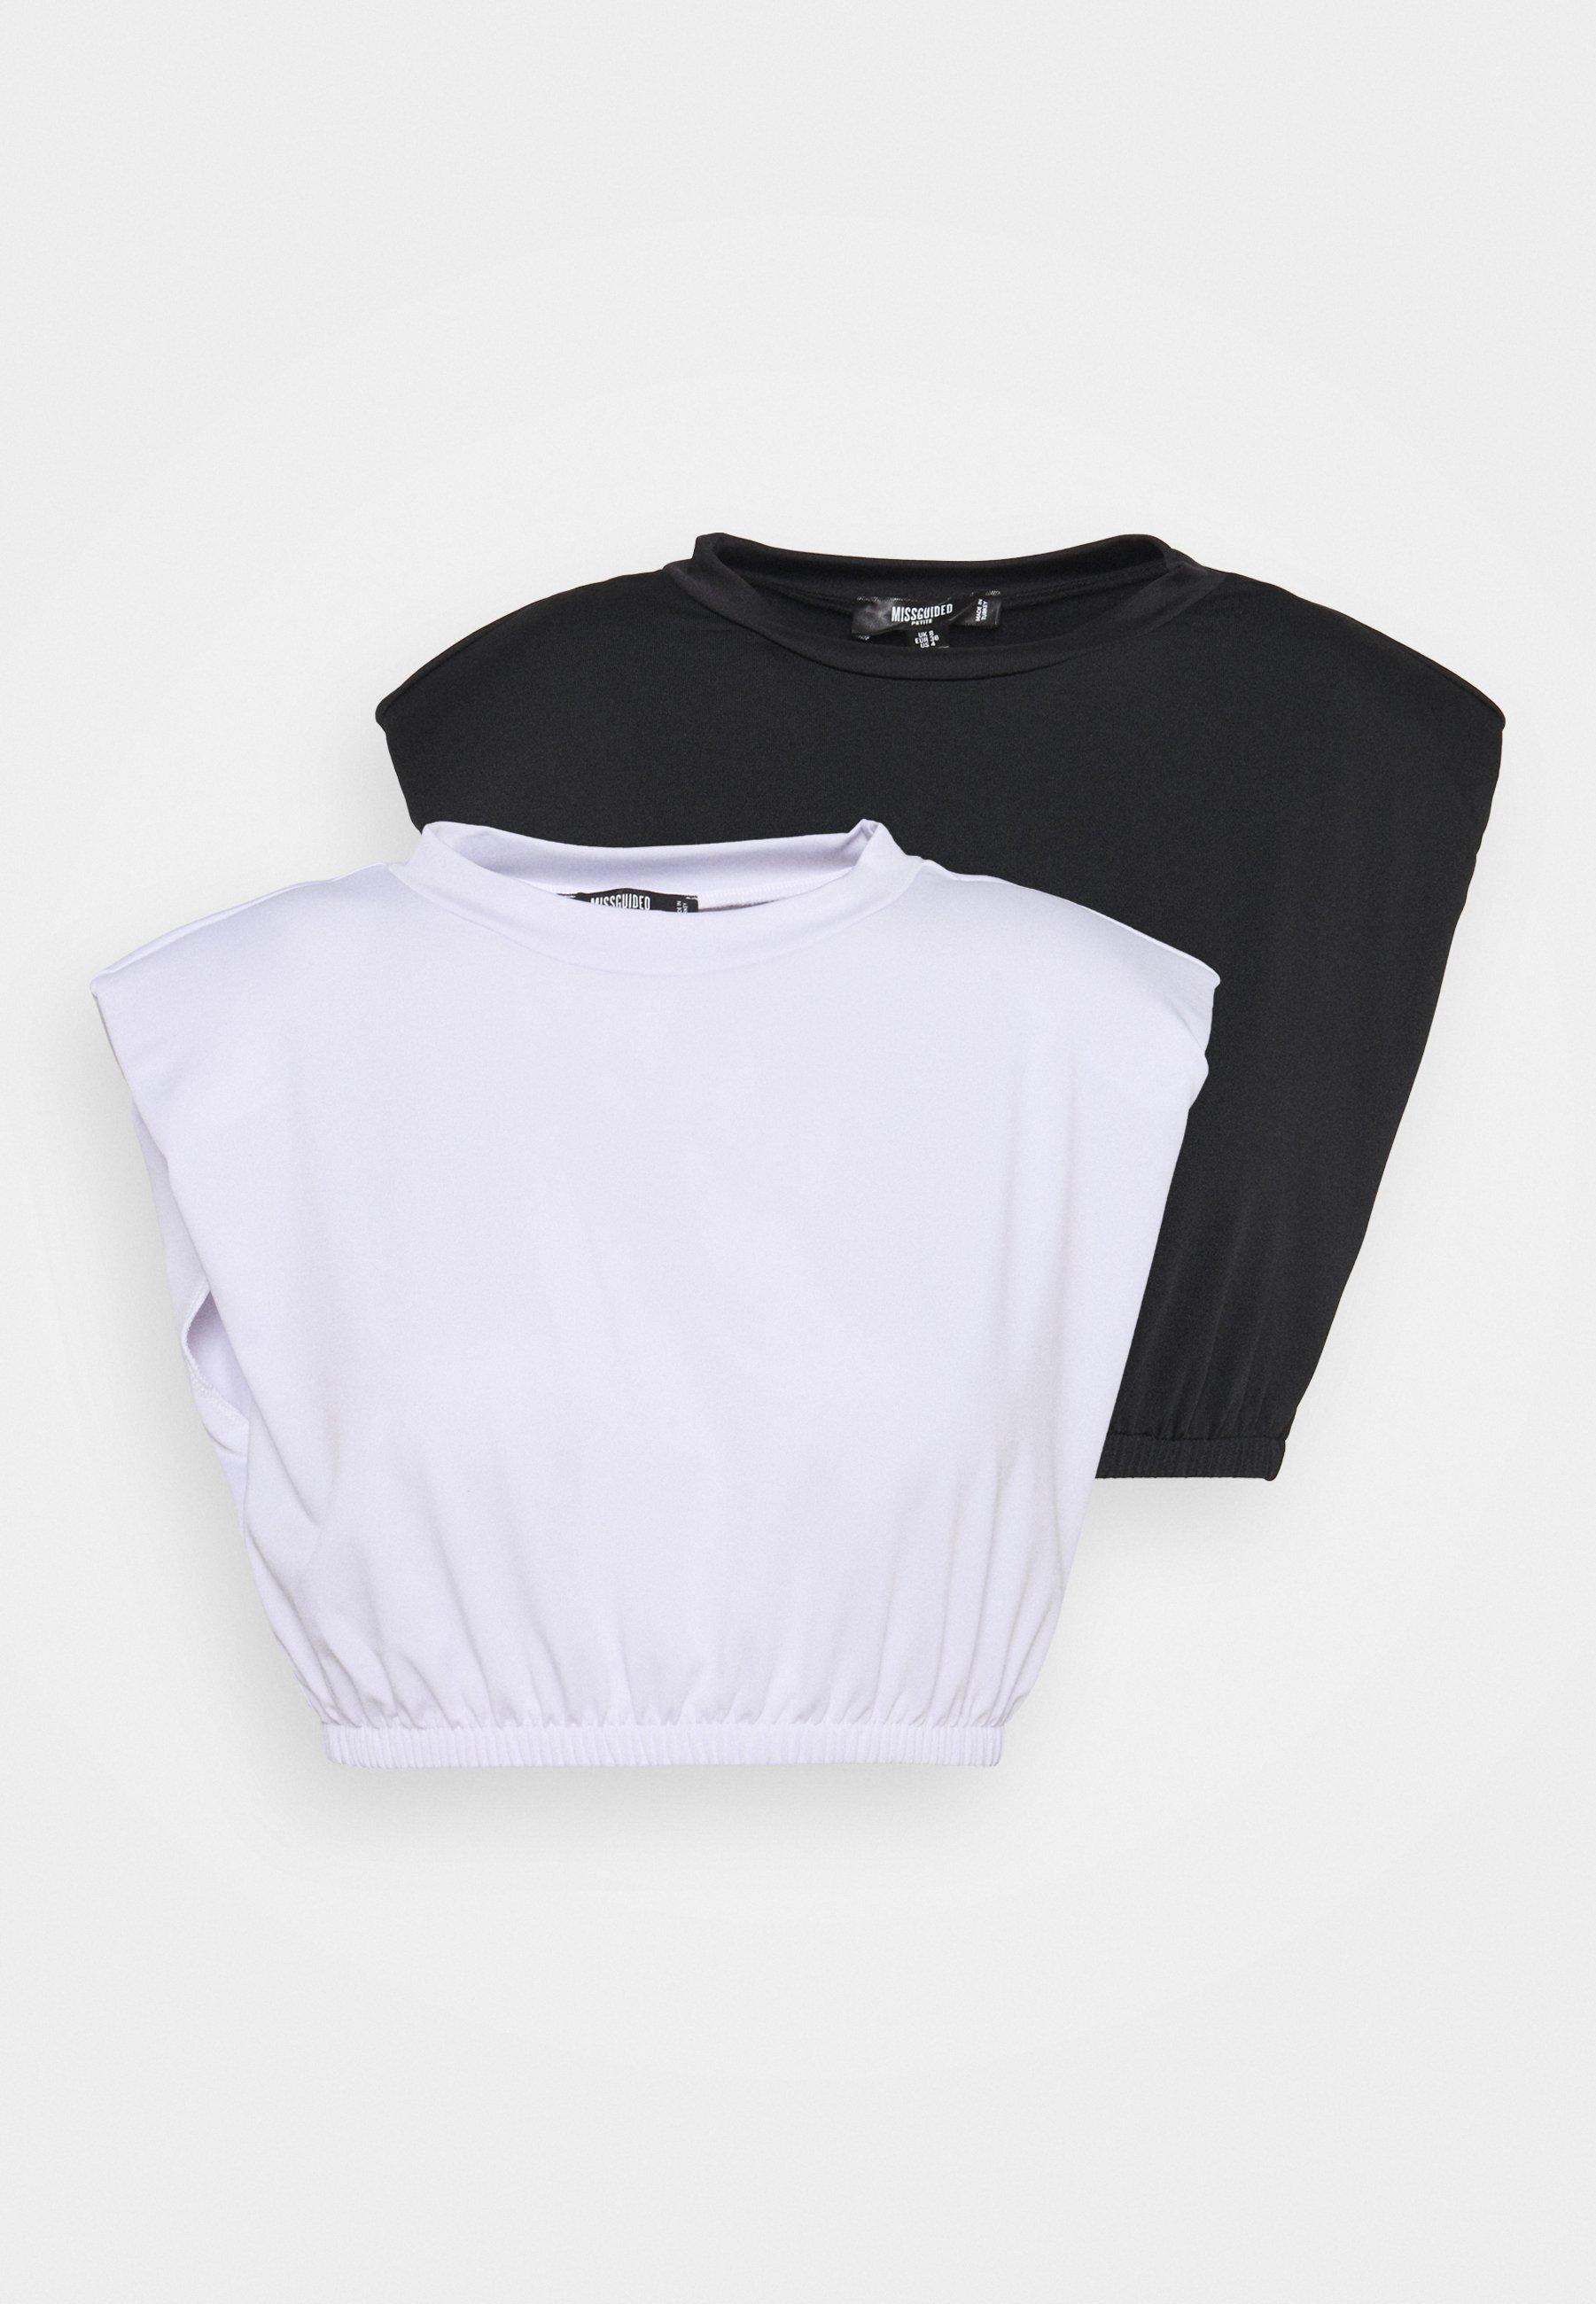 Women RECYCLED SHOULDER PAD CROP TOP 2PACK - Print T-shirt